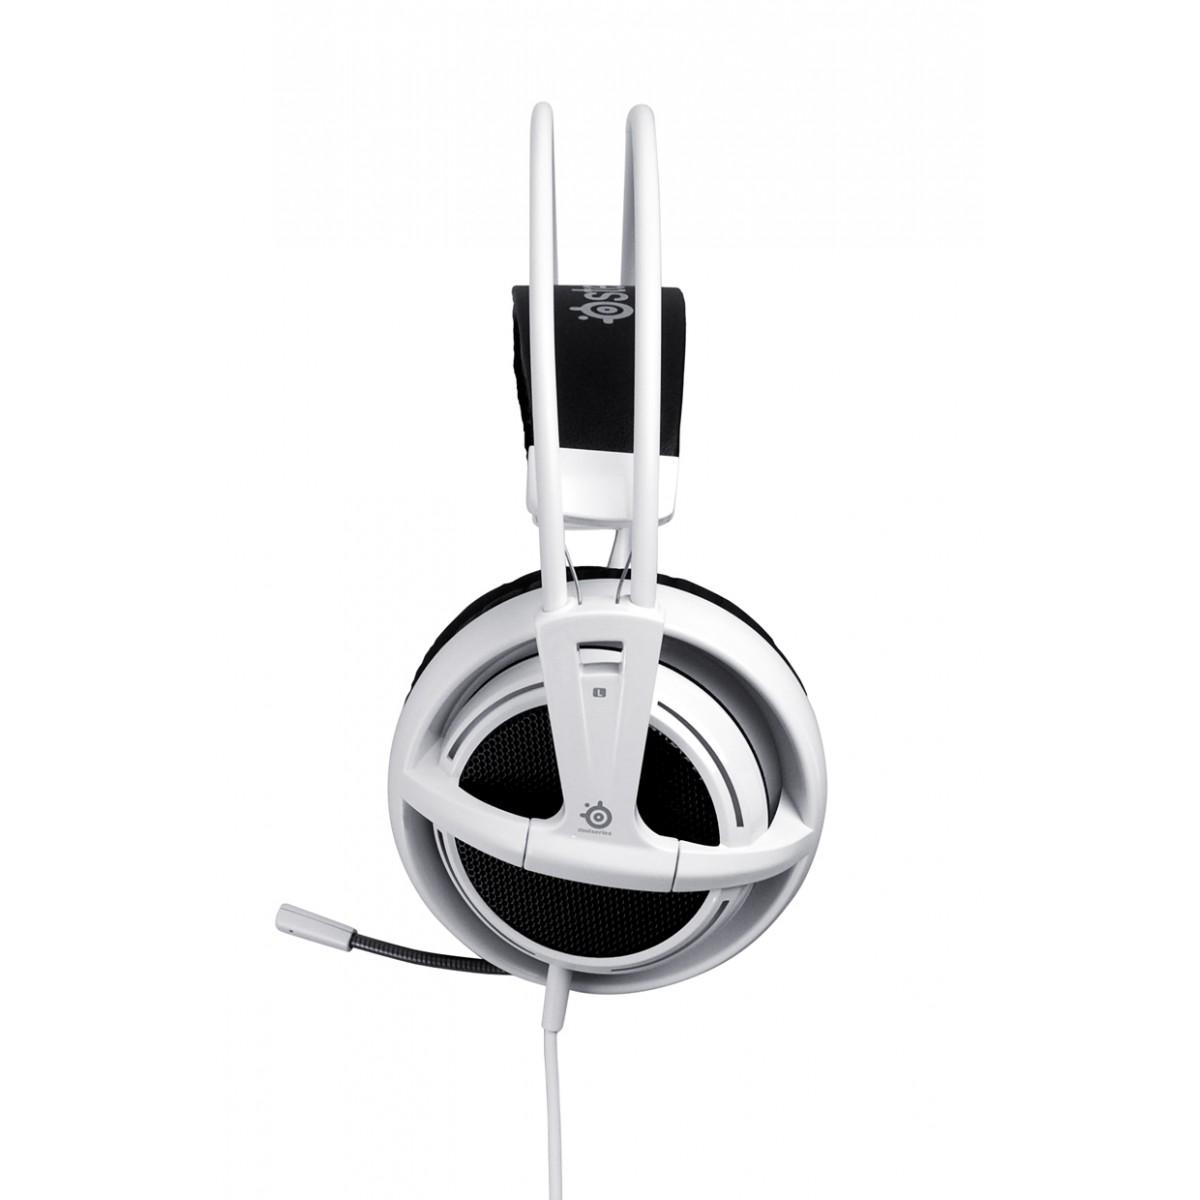 Fone de Ouvido Siberia V2 White com Microfone 51100 - Steelseries